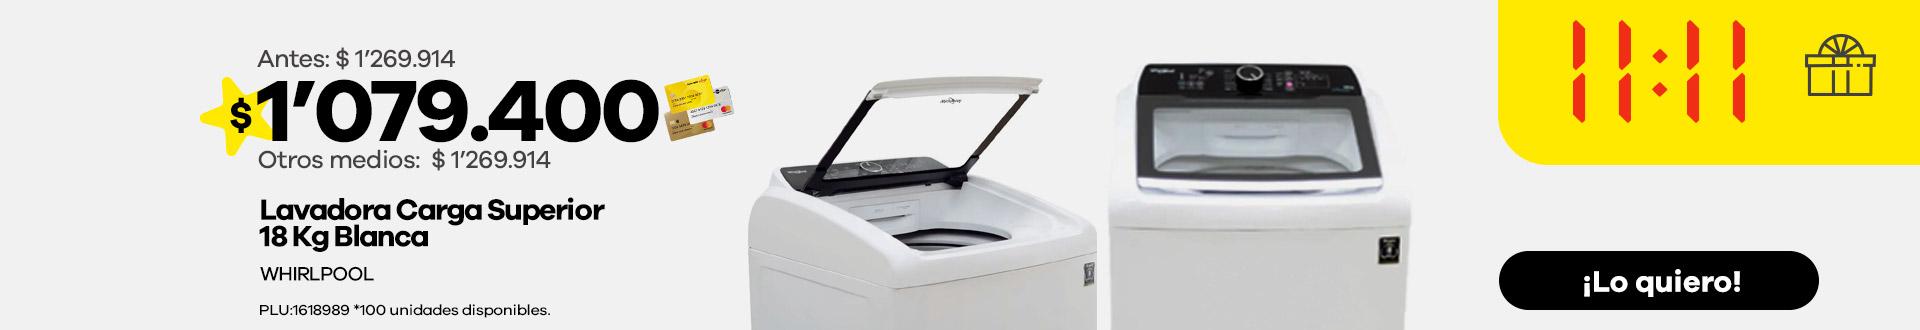 superior-whirlpool-18-kg-blanca